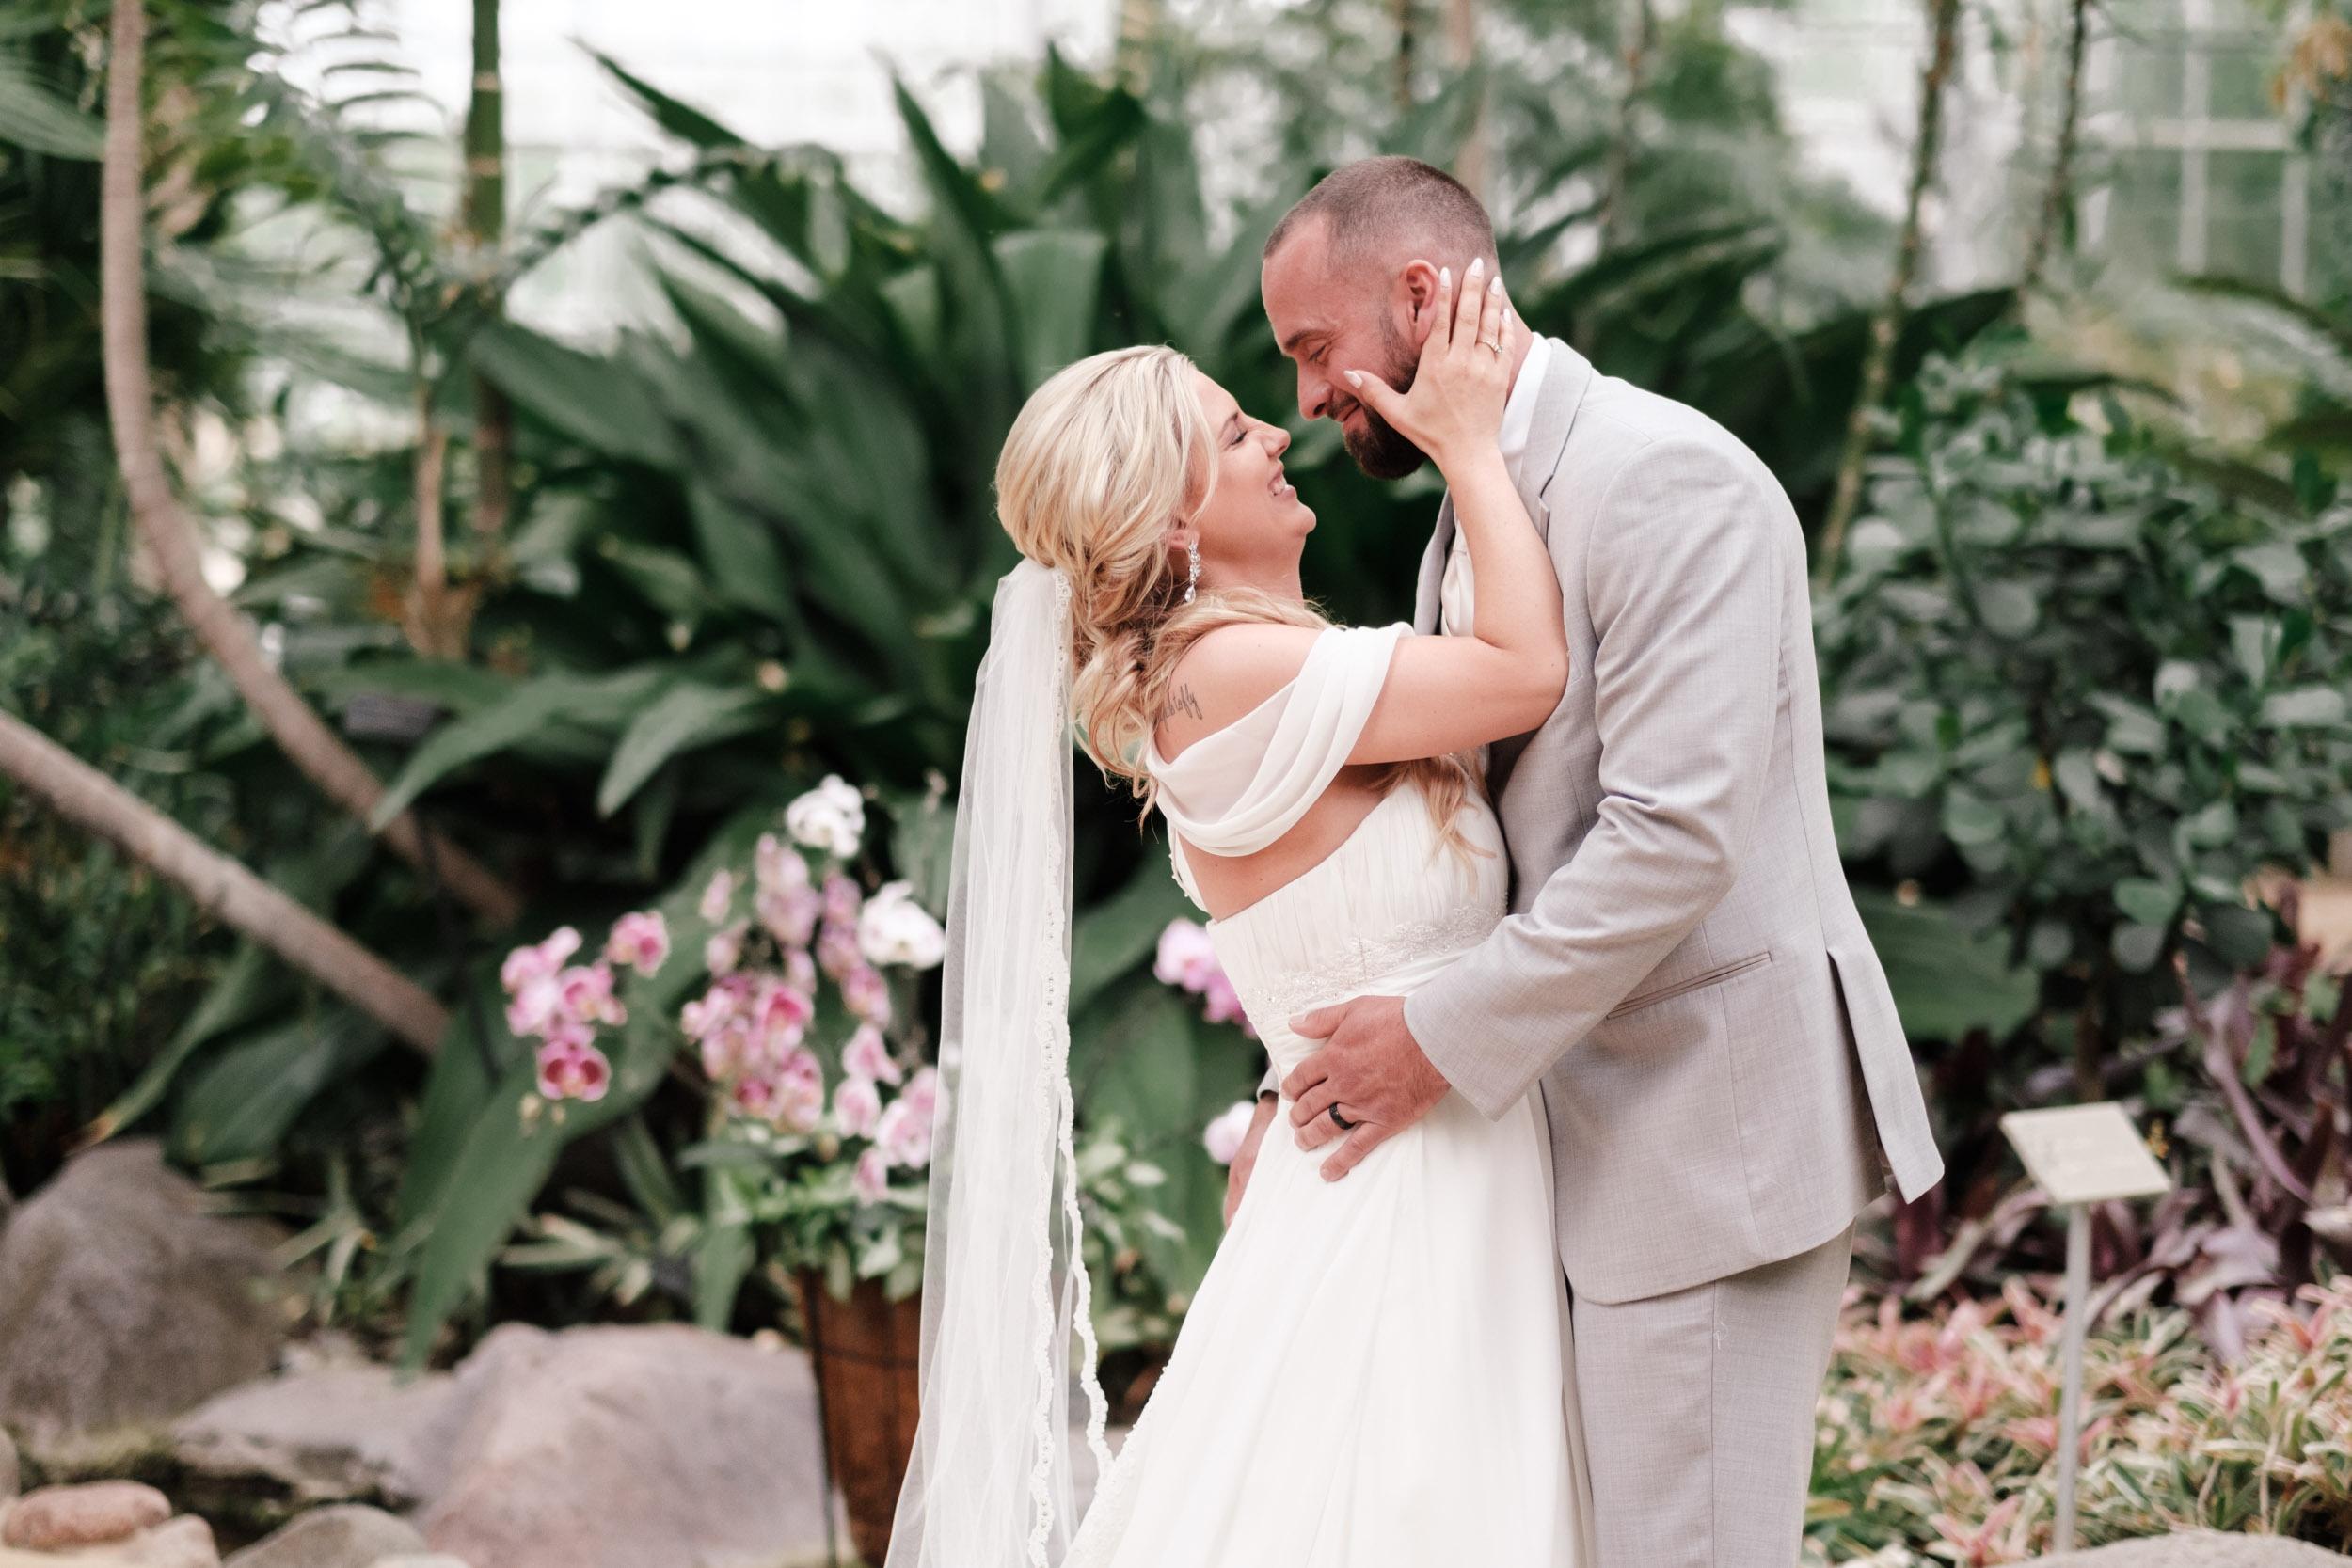 19-06-01 Megan Josh - Nicholas Conservatory Wedding-32.jpg